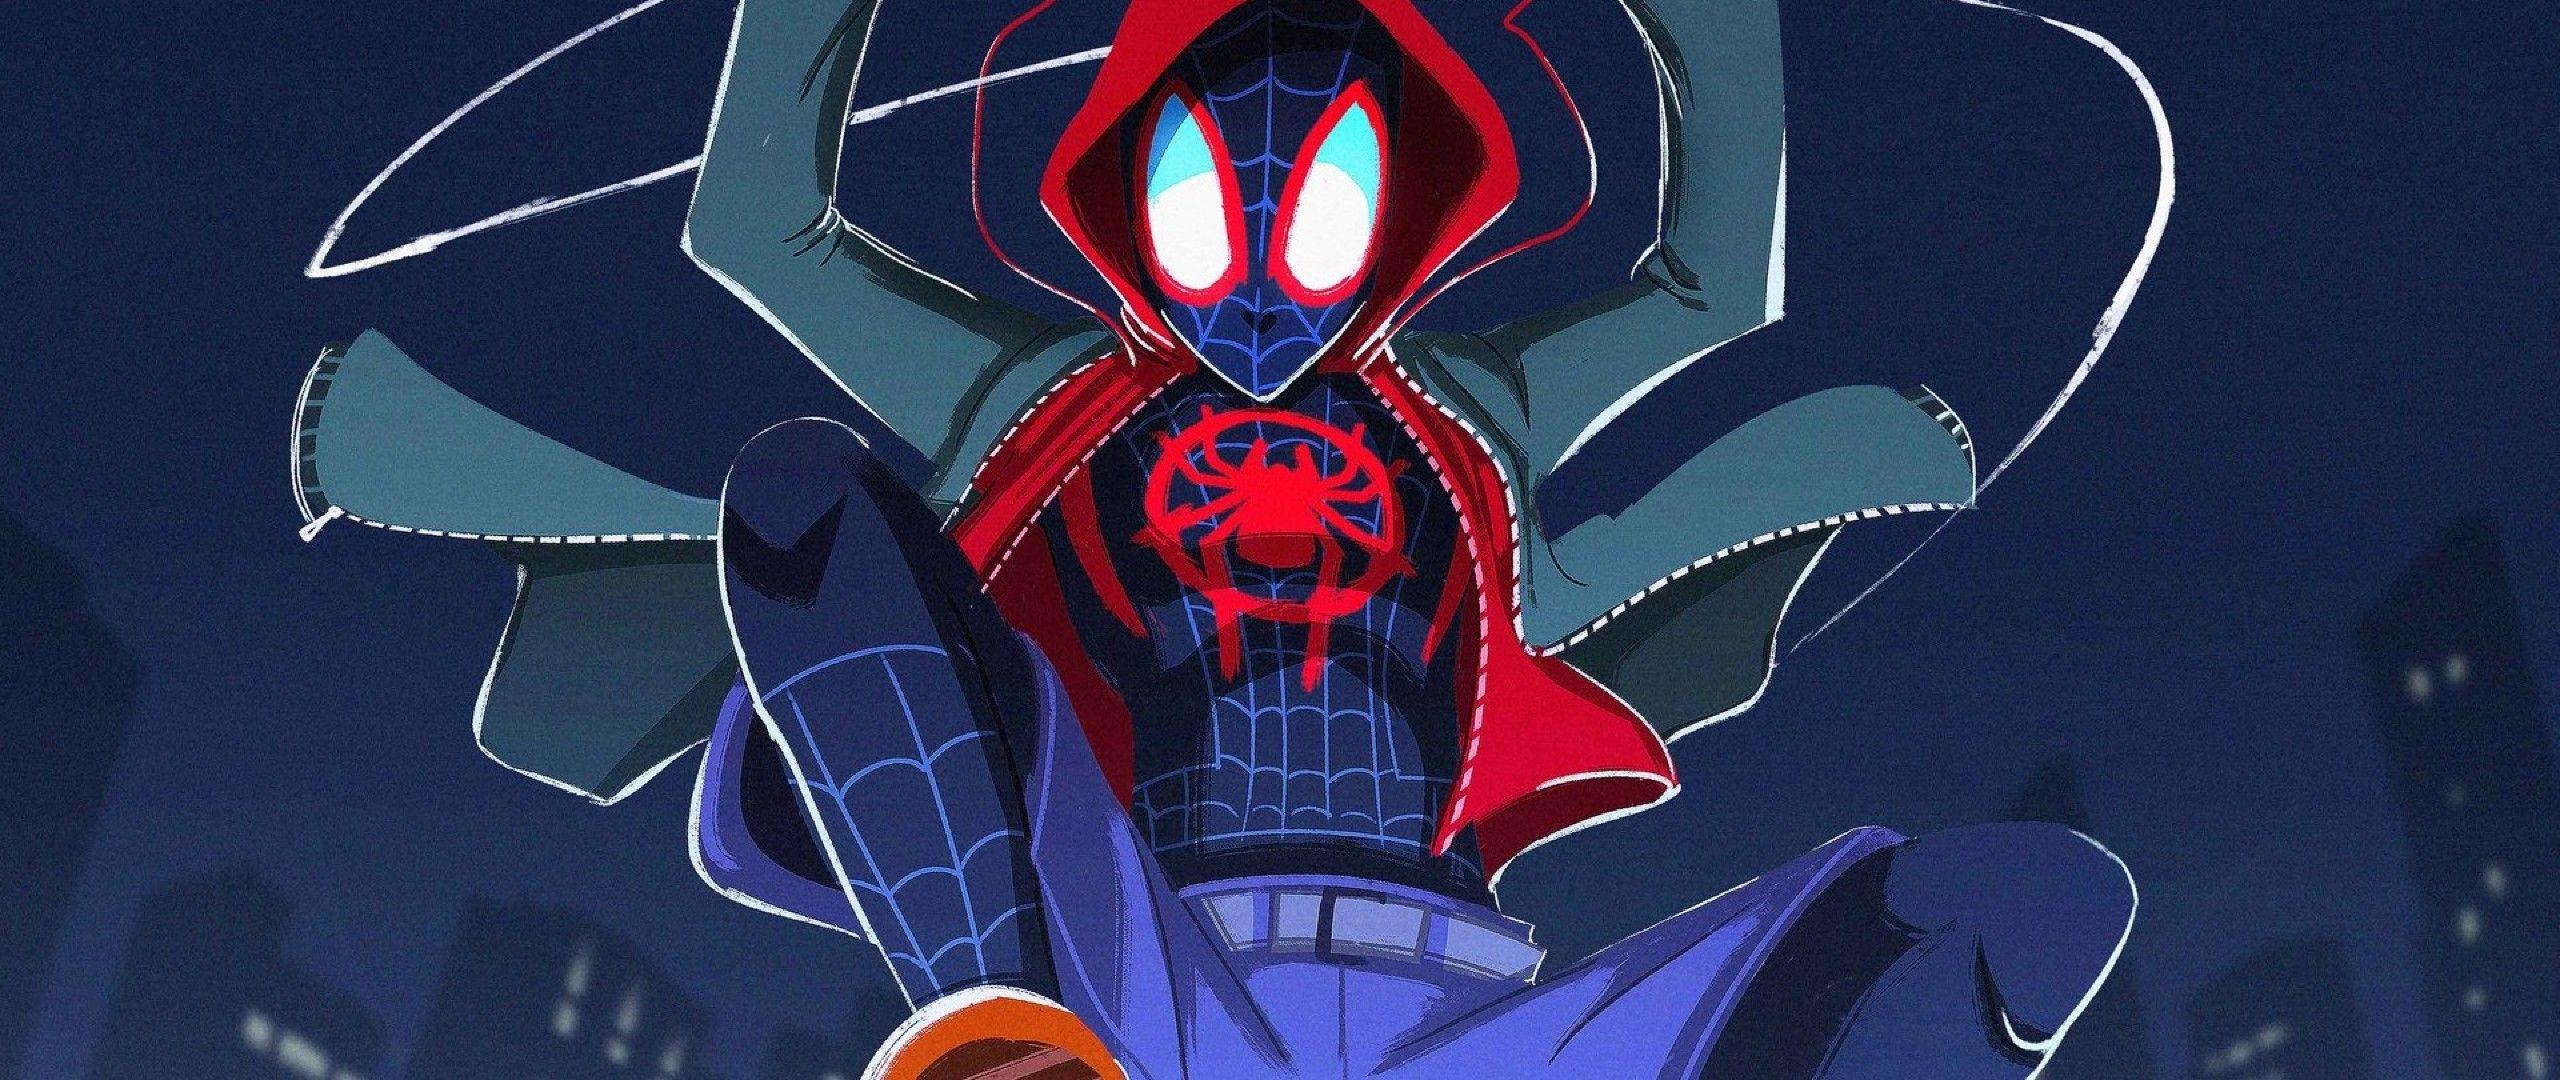 Download Spiderman Into The Spiderverse 2018 Fanart 2048x1152 Resolution Full Hd Wallpaper Cartoon Wallpaper Spiderman Spider Verse